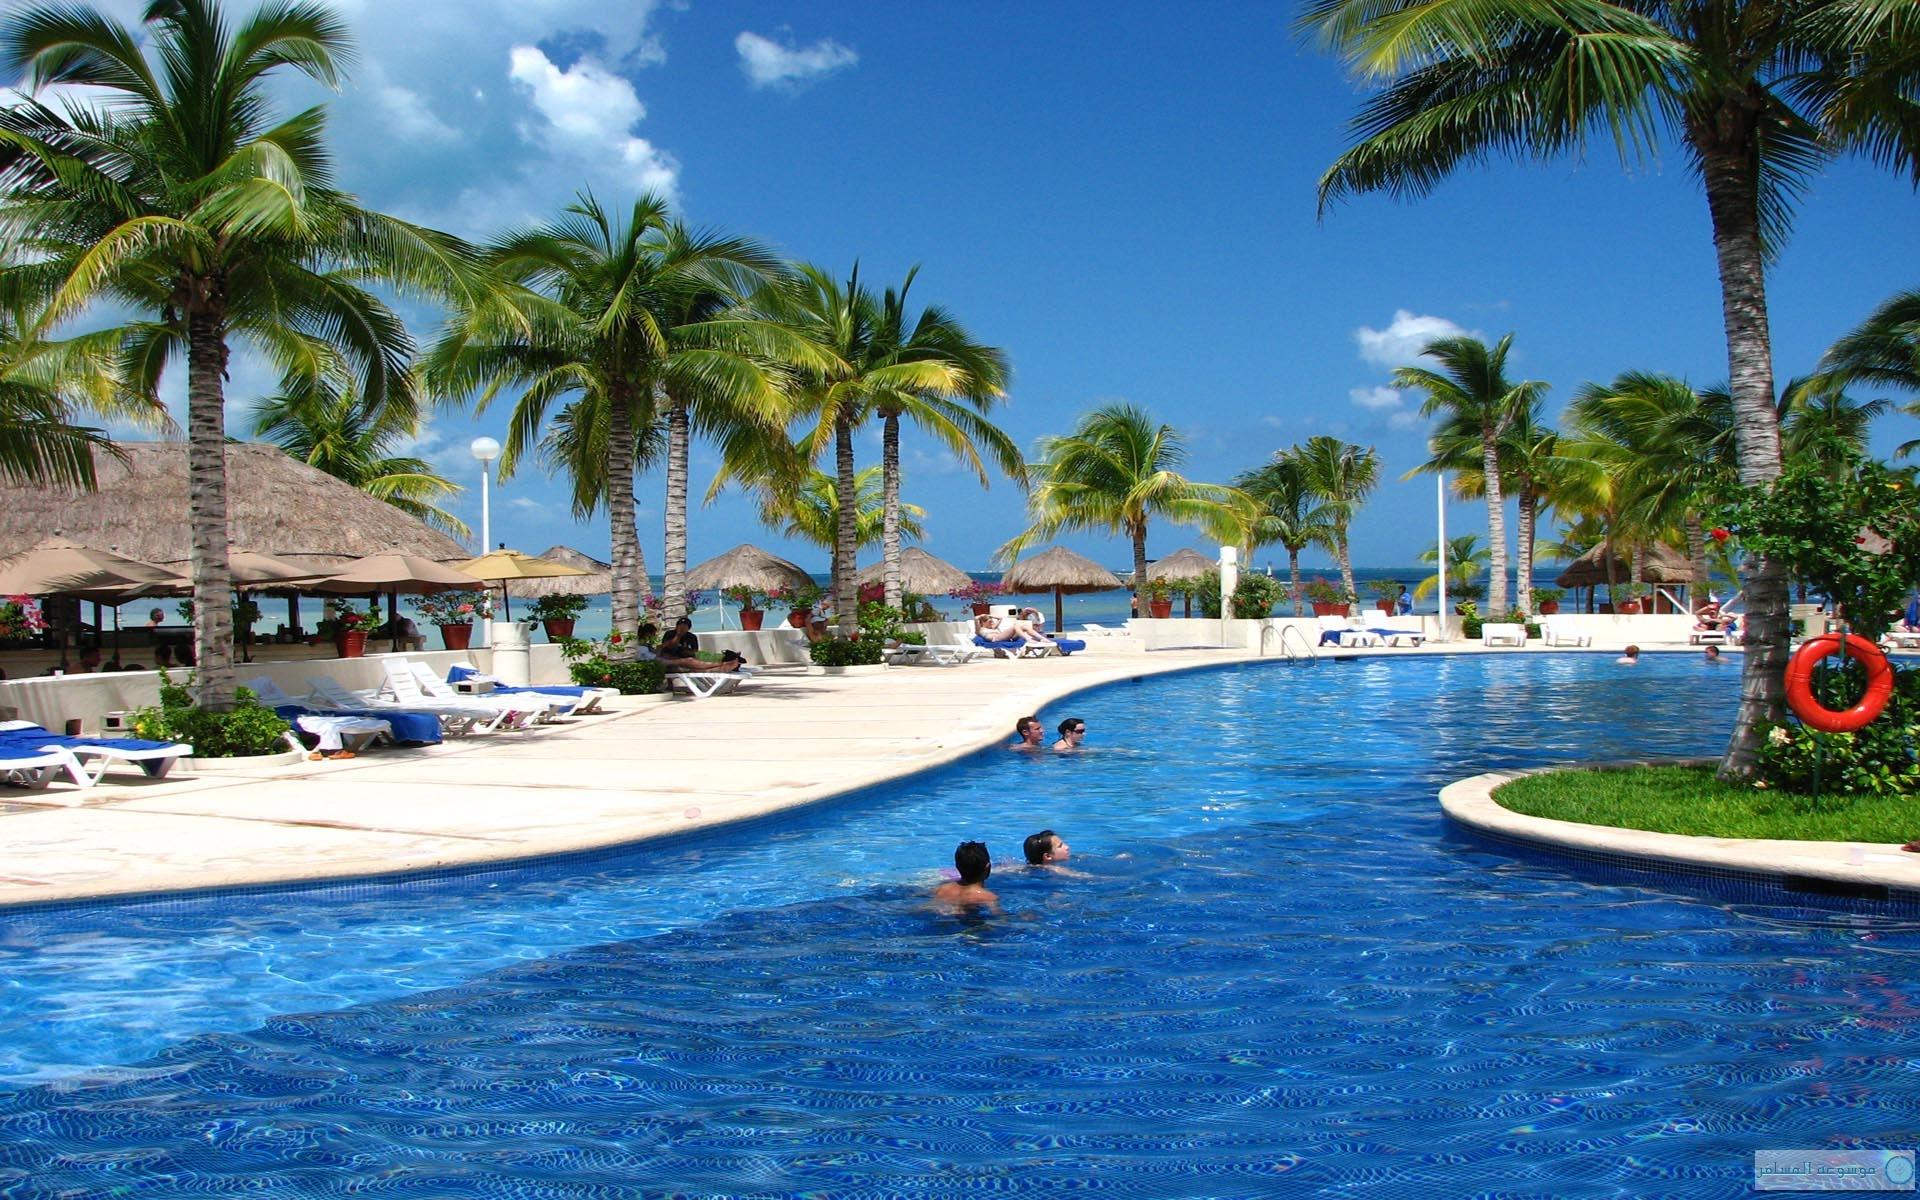 playa-del-carmen-cancun-mexico